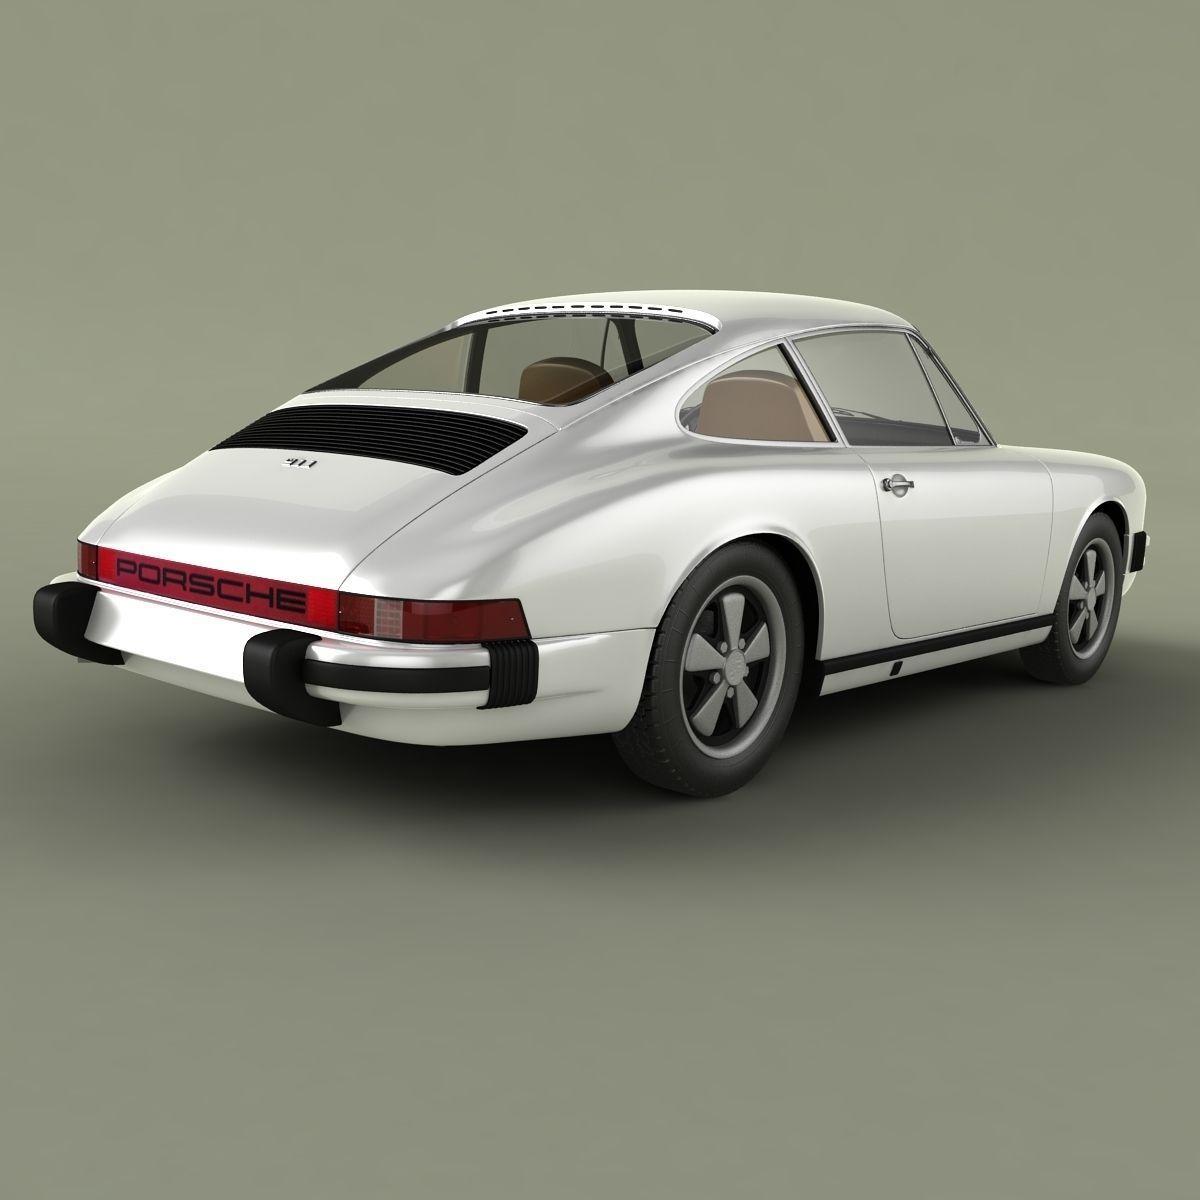 porsche 911 1974 3d model max obj. Black Bedroom Furniture Sets. Home Design Ideas